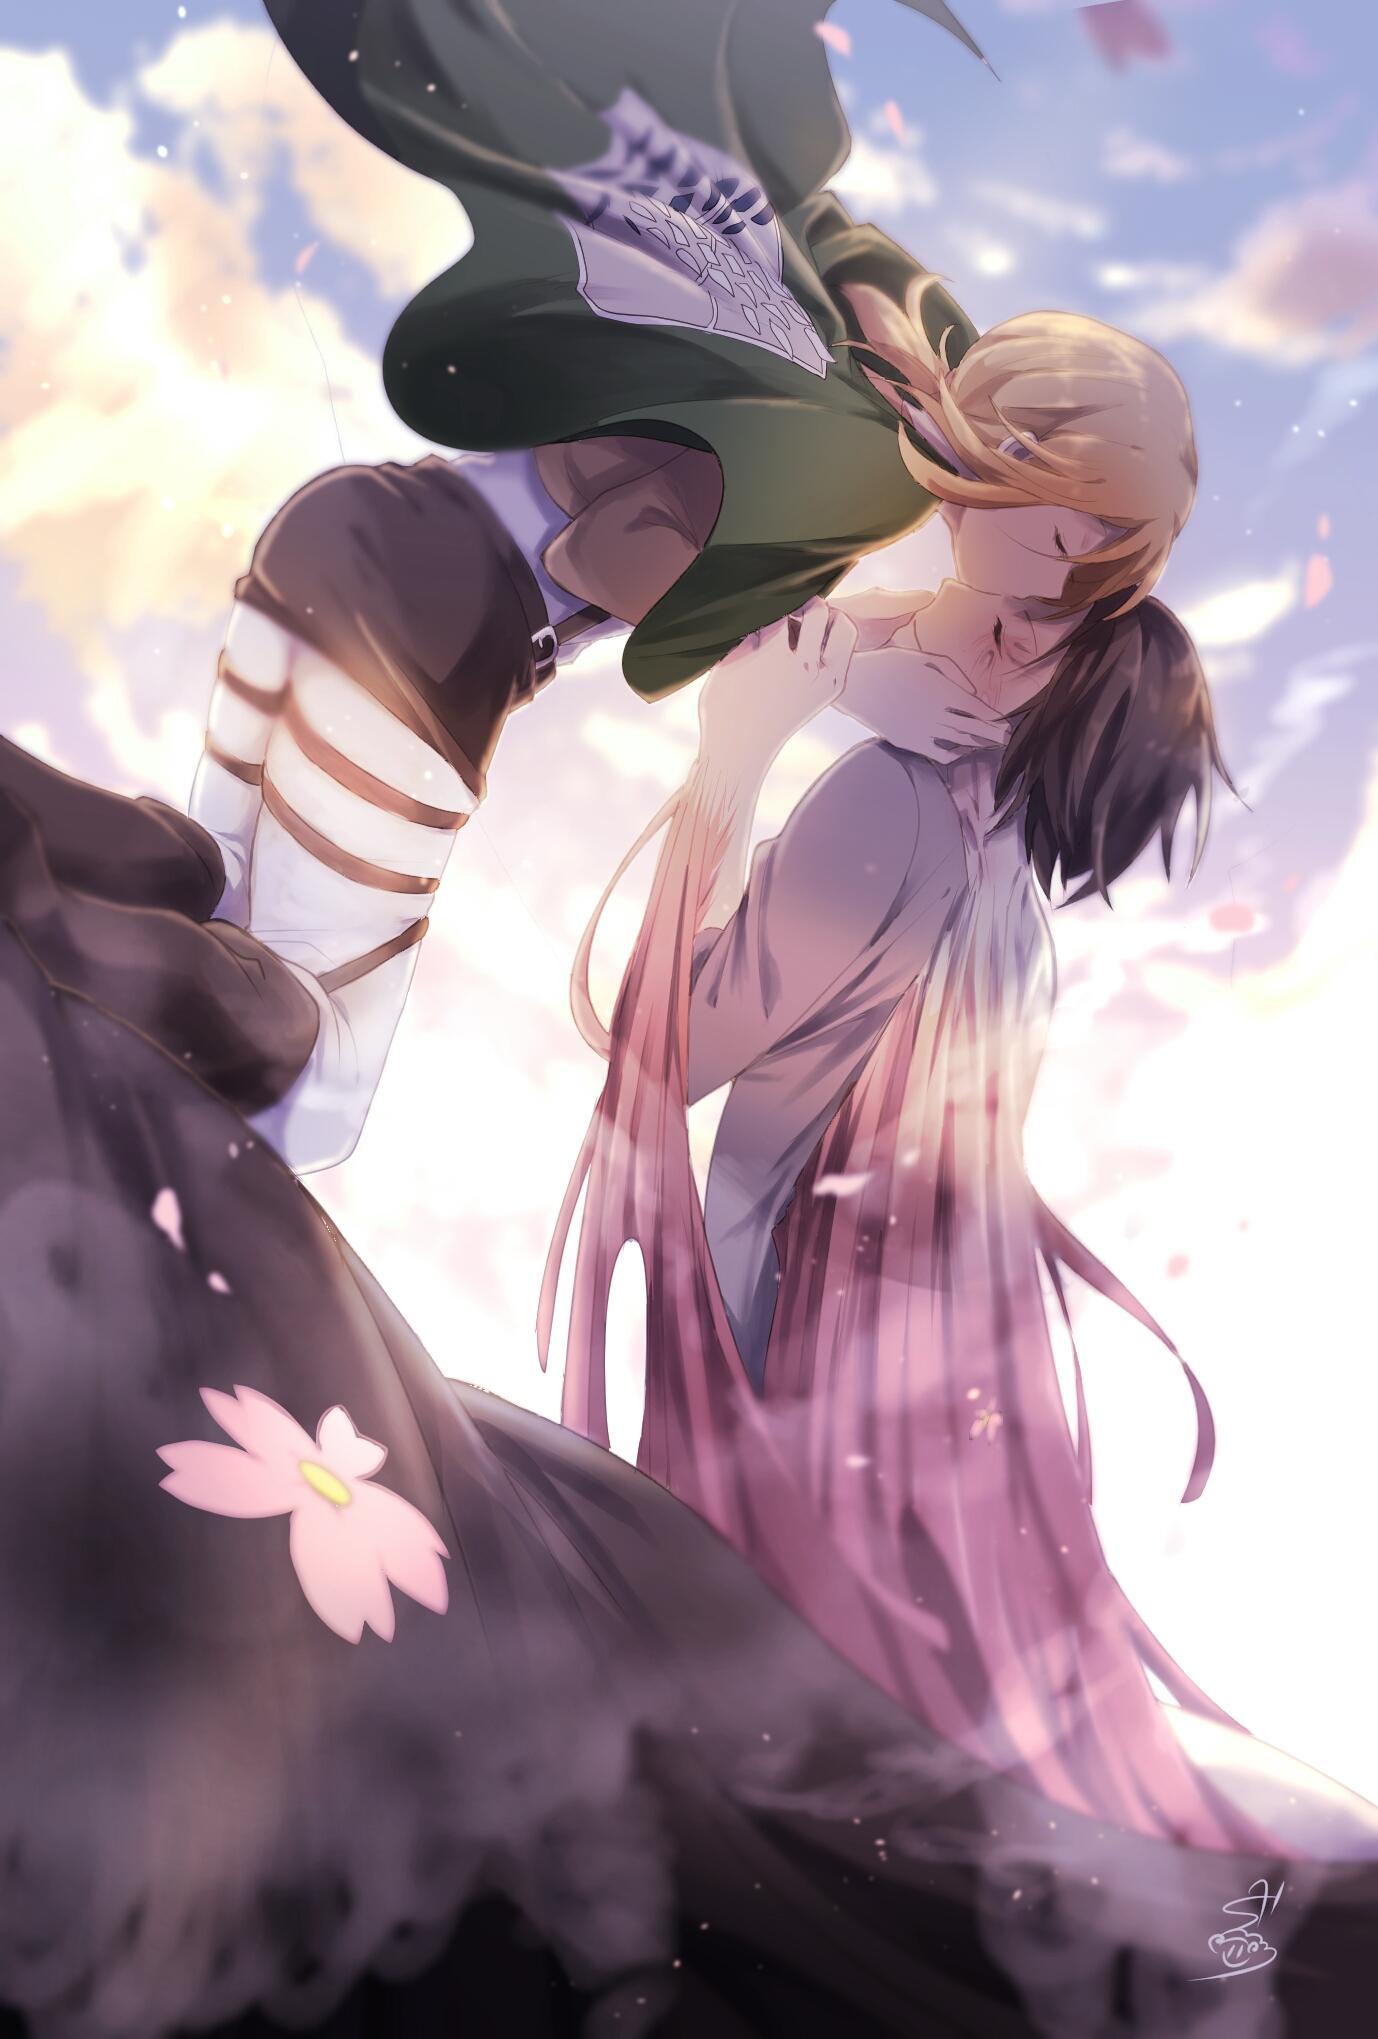 Attack On Titan Mobile Wallpaper 2108604 Zerochan Anime Image Board